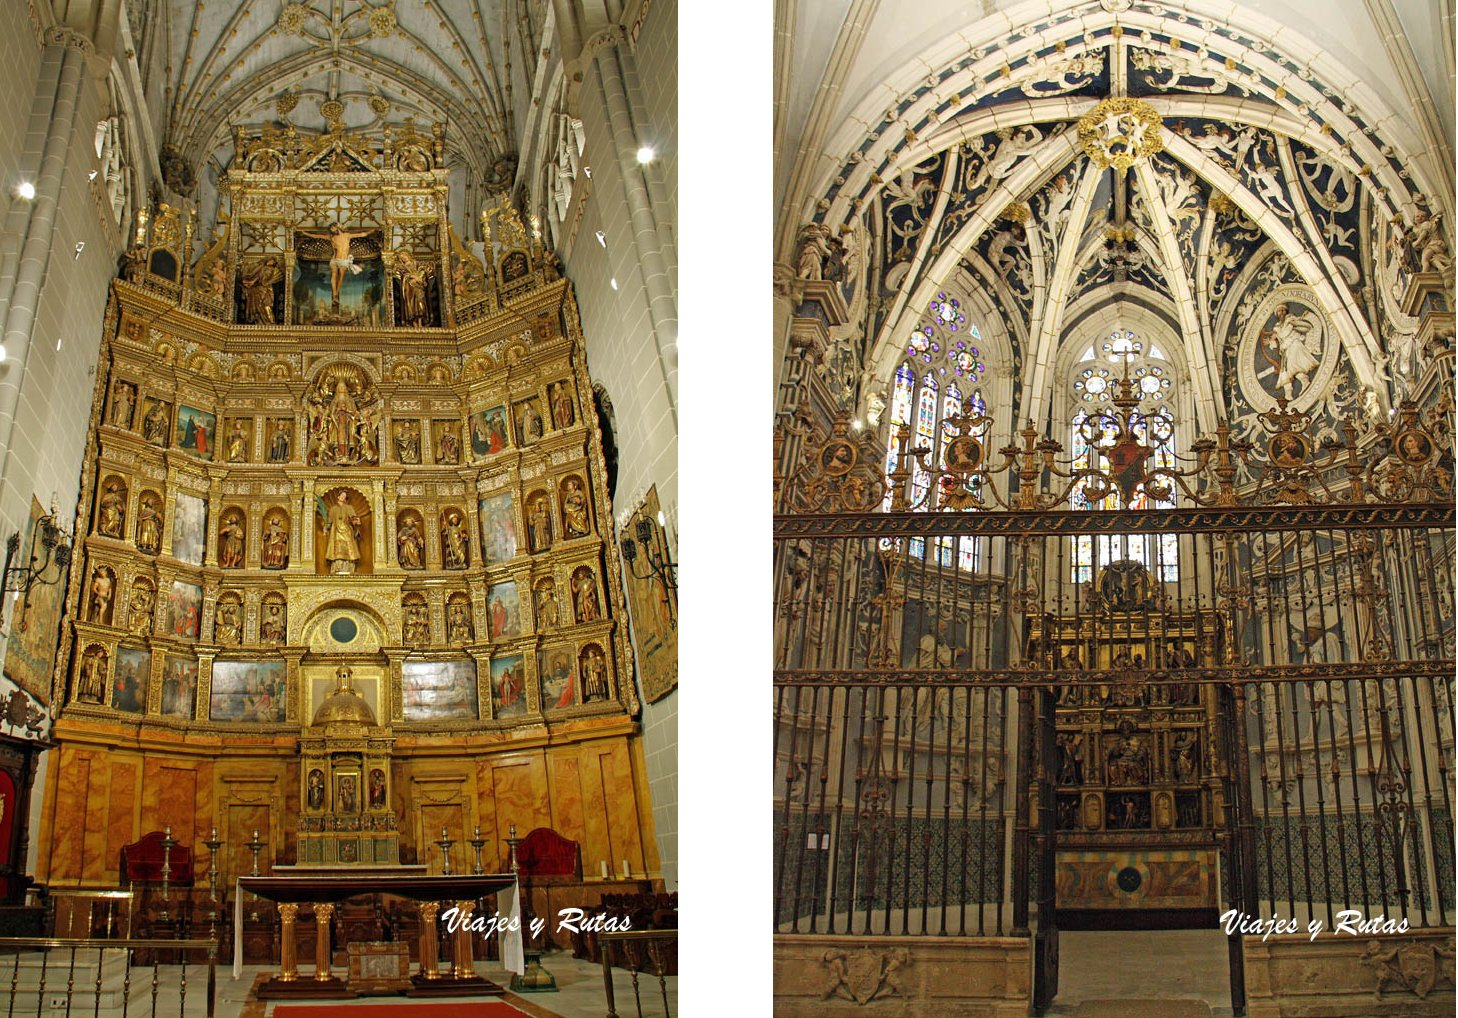 Detalles del interior de la catedral de Palencia